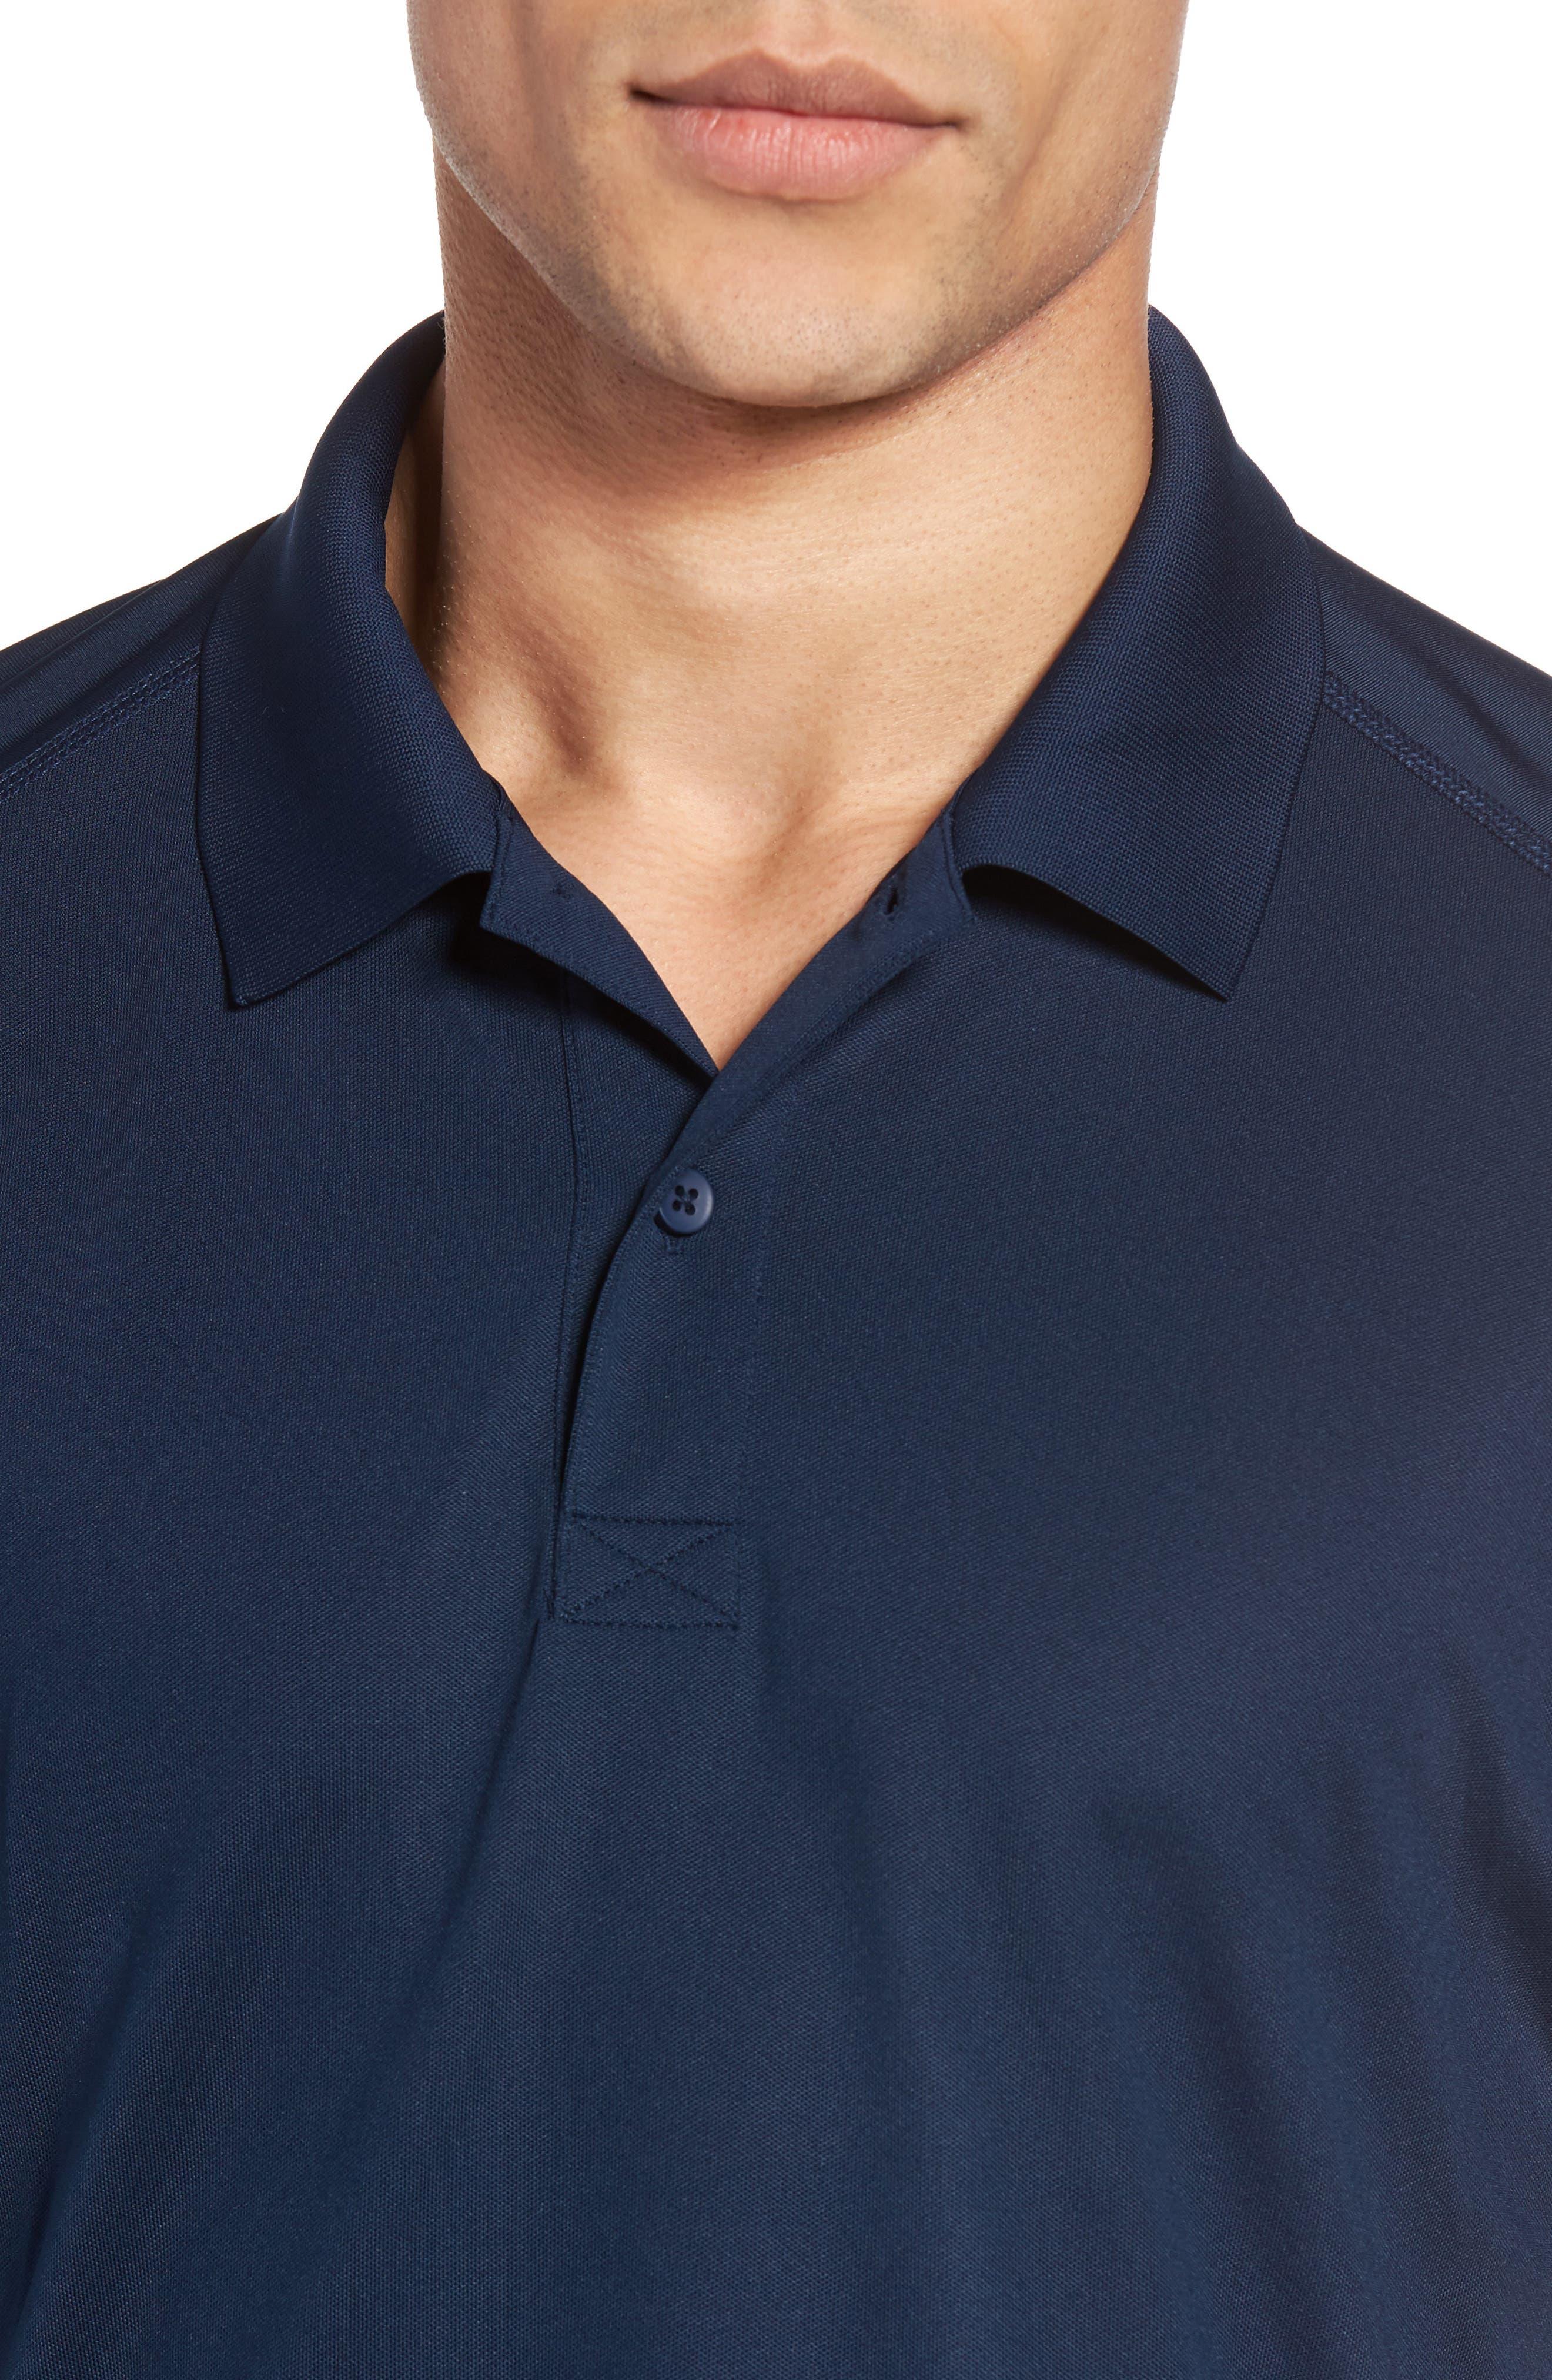 M-Flex Flatiron Slim Fit Golf Polo,                             Alternate thumbnail 4, color,                             Navy